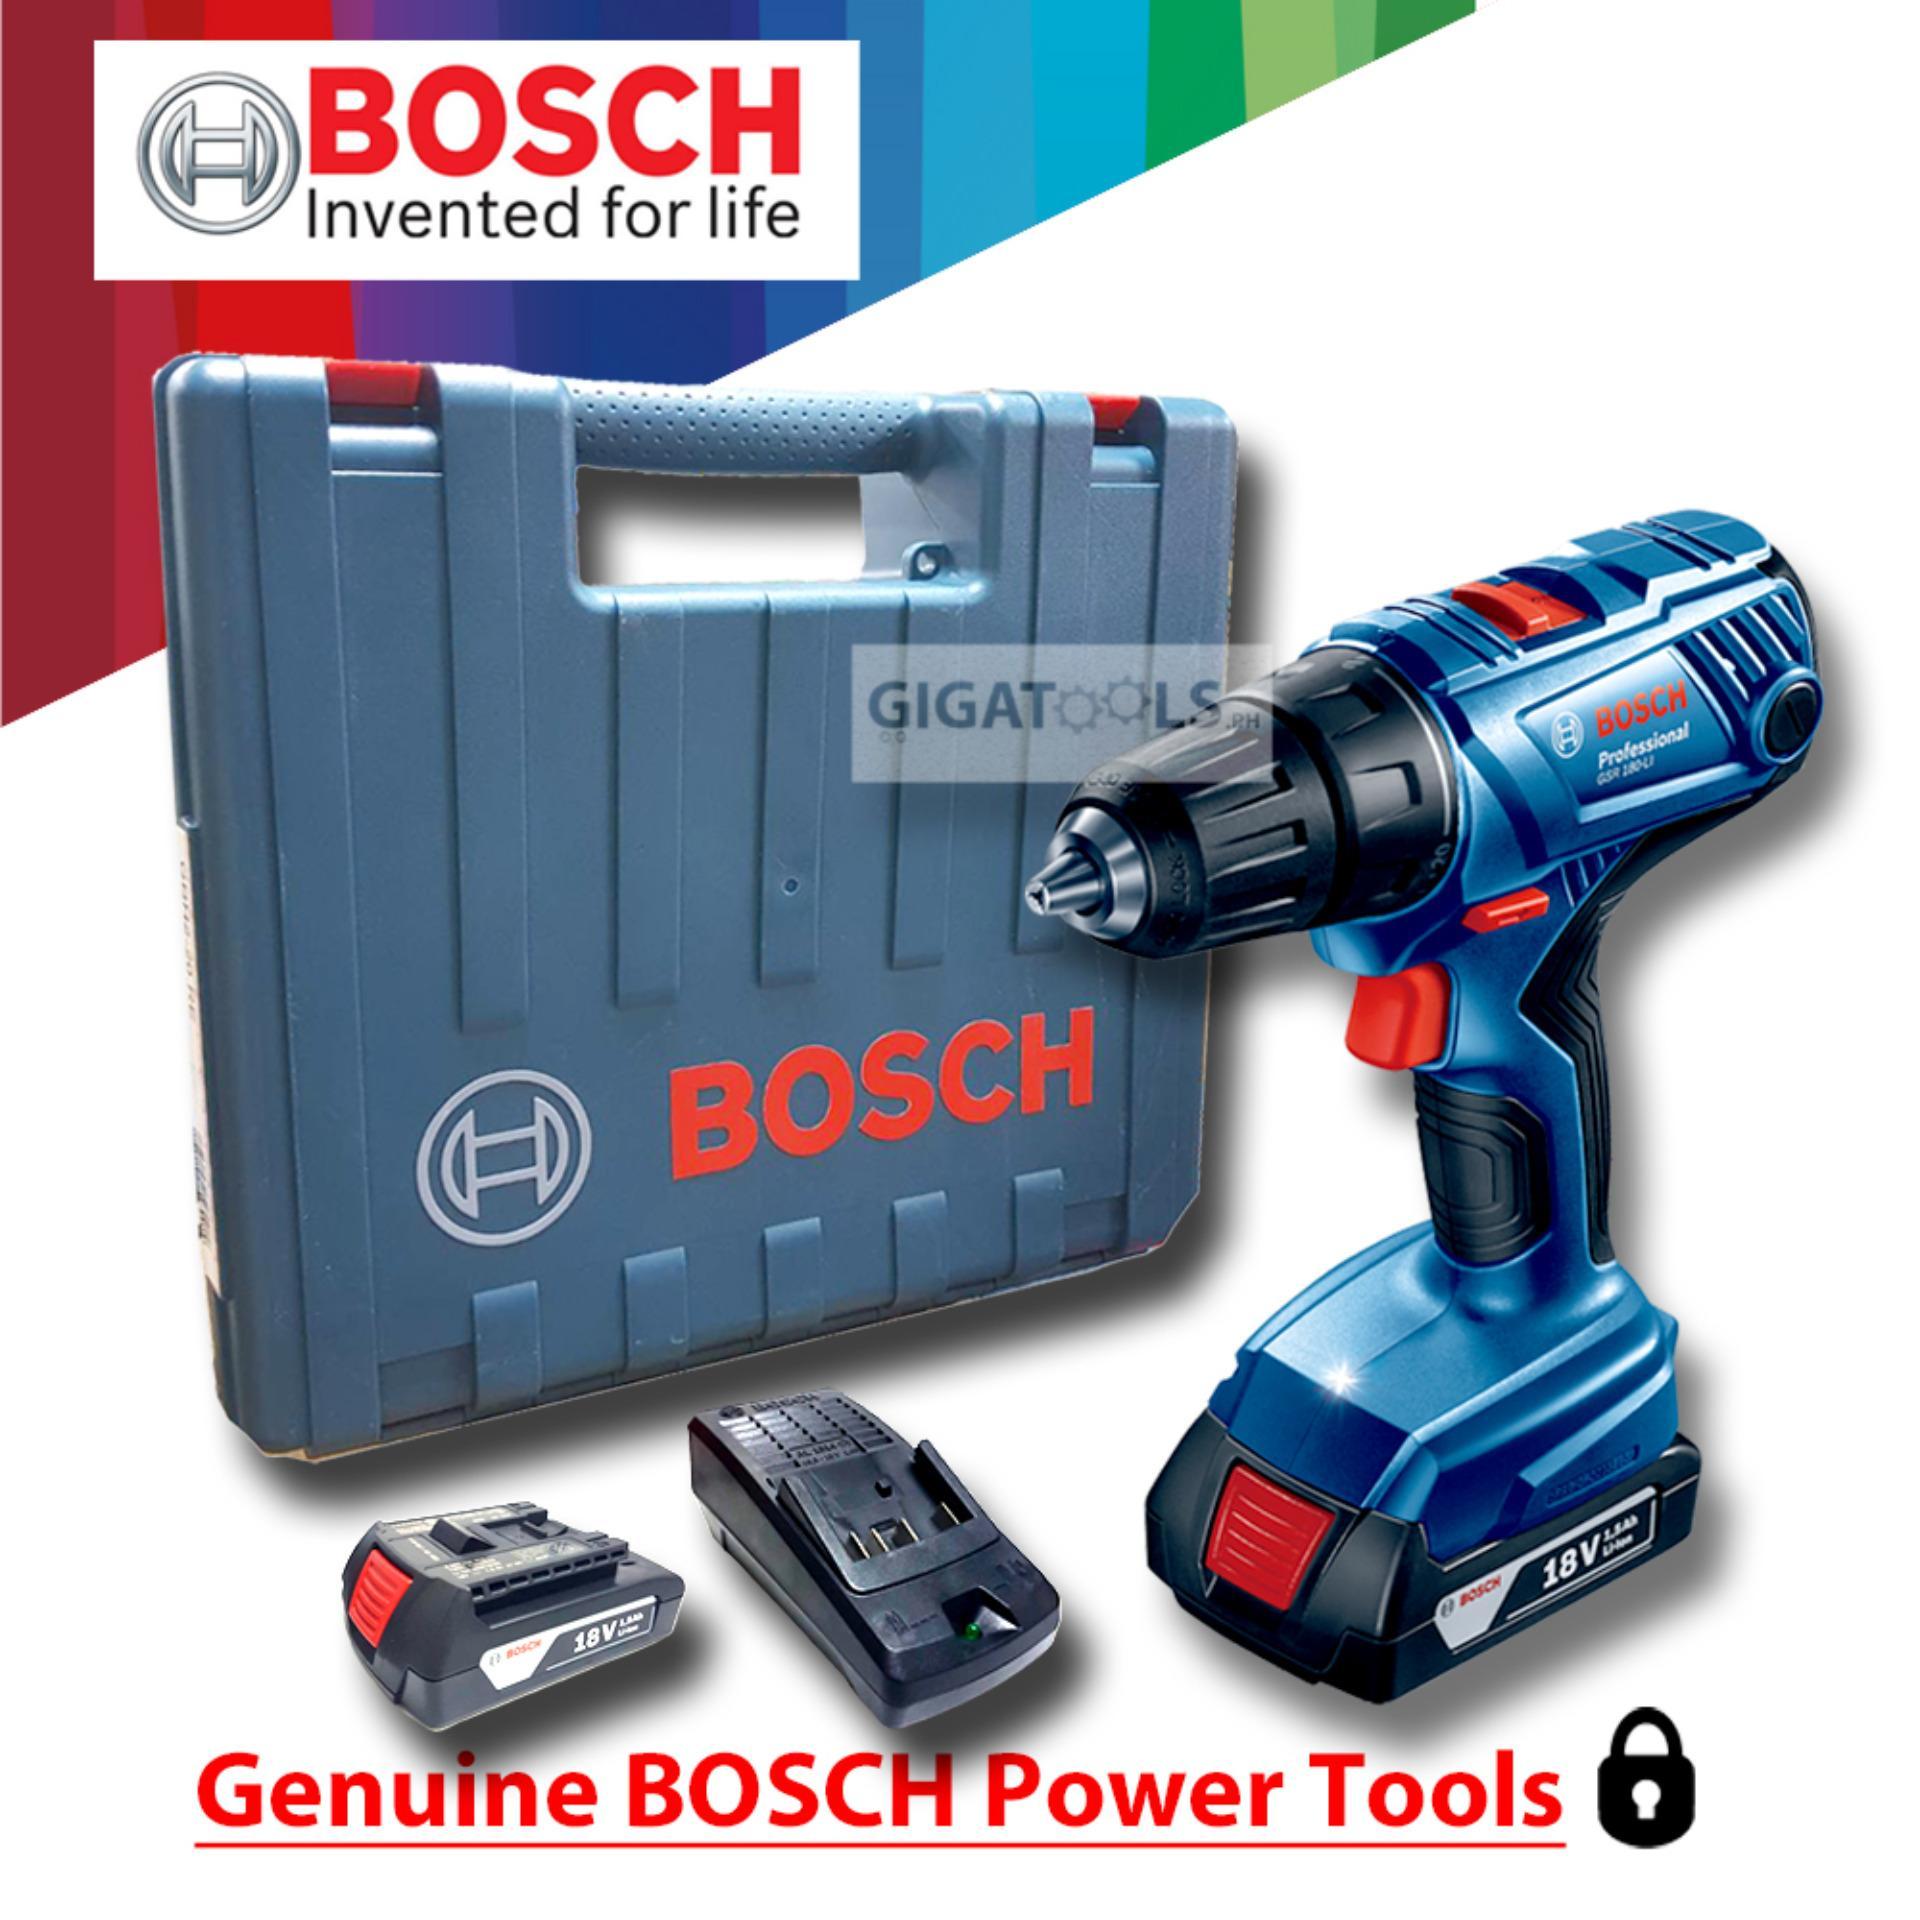 bosch gsr 180 li professional cordless drill driver 18v philippines. Black Bedroom Furniture Sets. Home Design Ideas